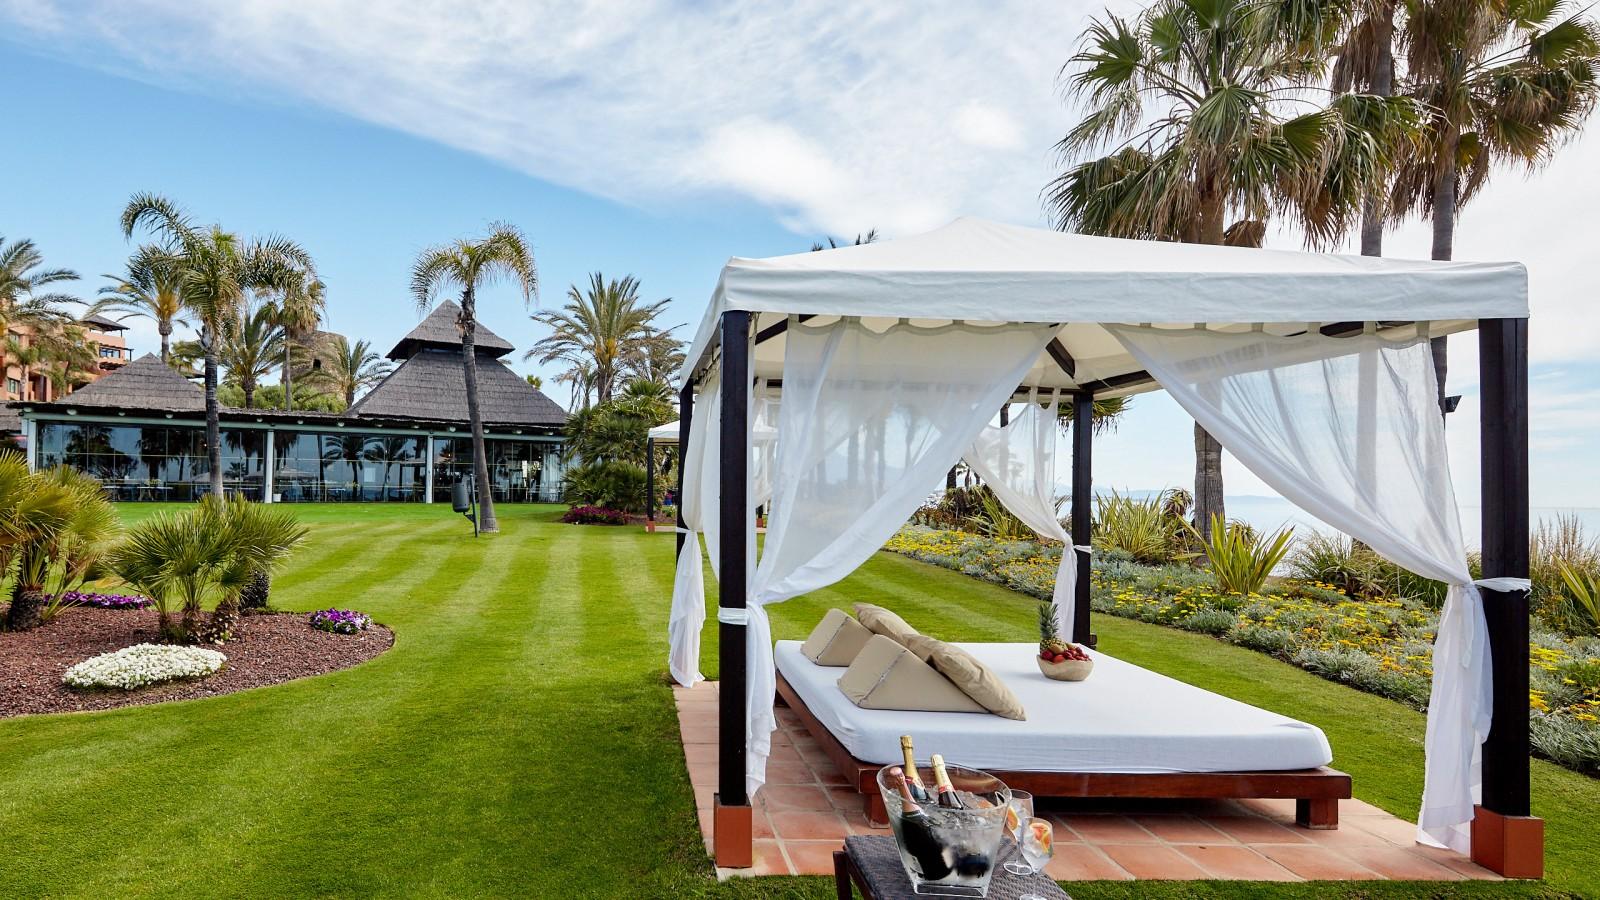 Kempinski Hotel Bahía Day Bed